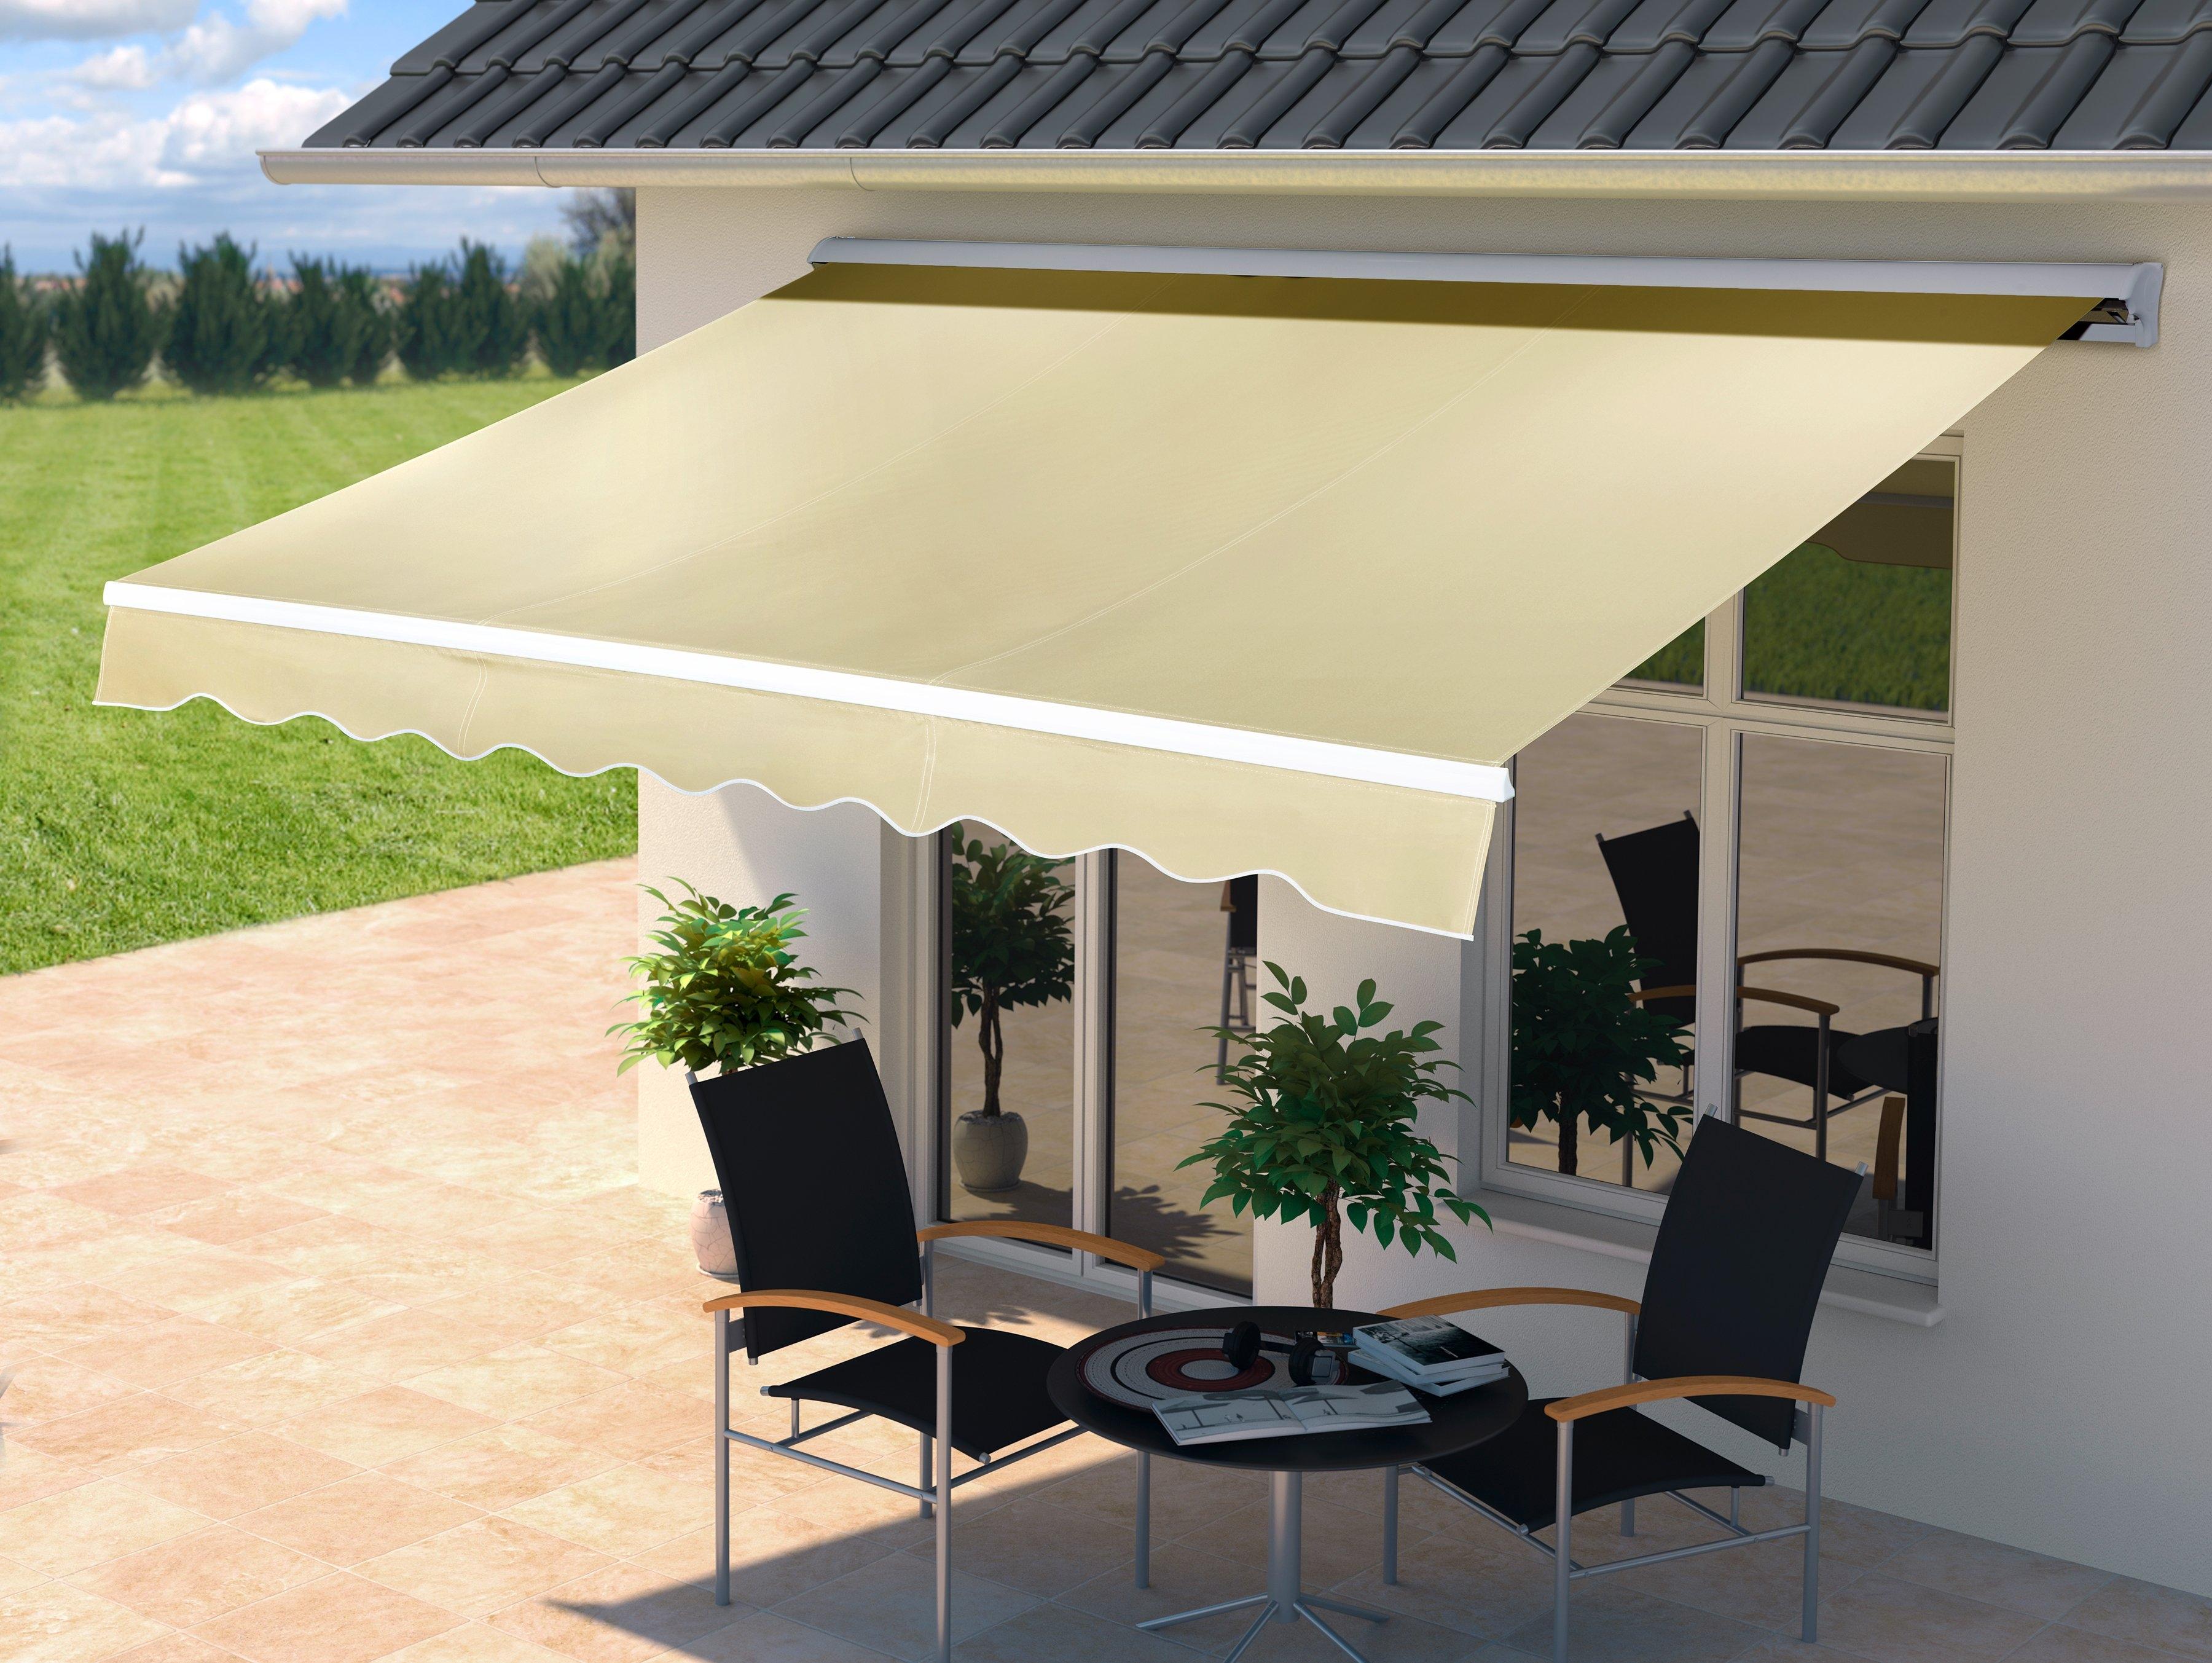 Verbazingwekkend Zonneschermen kopen? Bestel jouw zonnescherm vanaf € 72,99 | OTTO XM-71